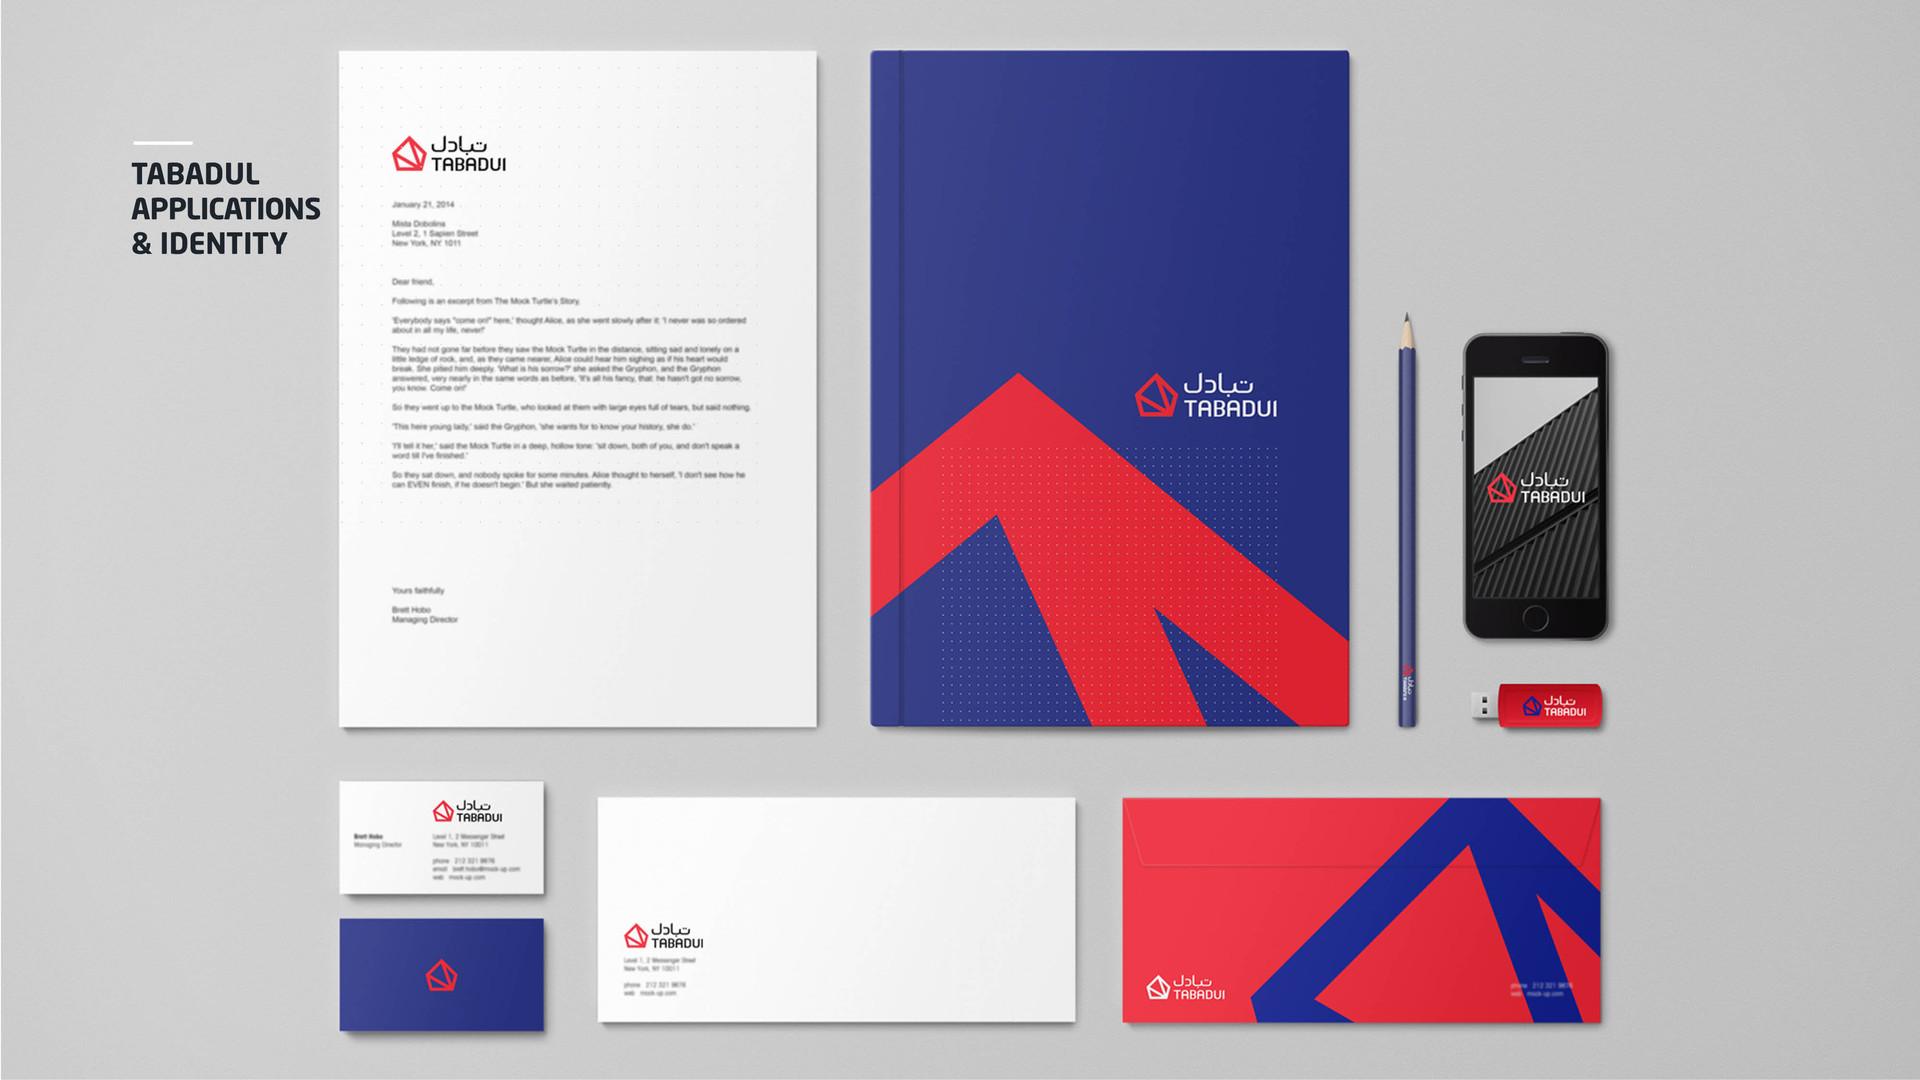 Tabadul-New Brand-2018-V325.jpg